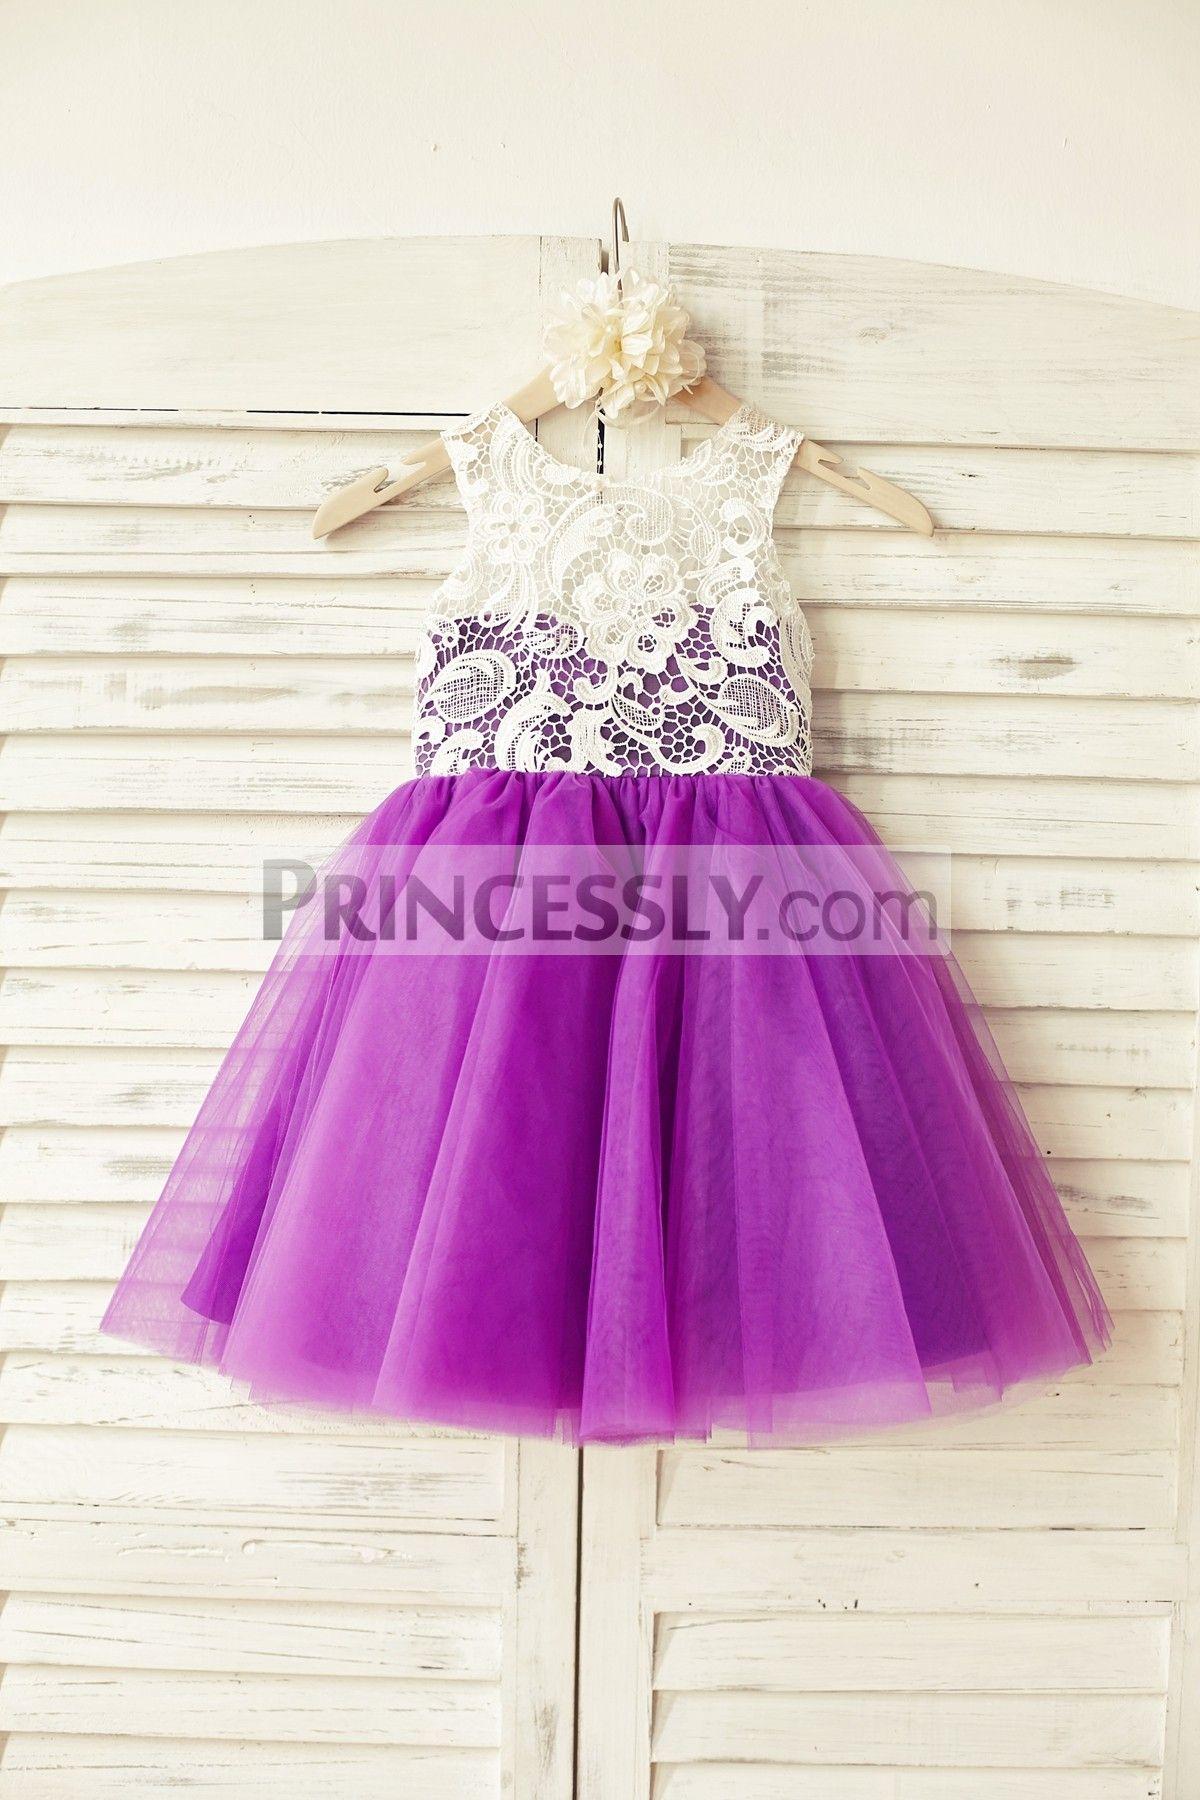 Princessly.com-K1000104-Ivory-Lace-Blush-Pink-Tulle-Flower-Girl ...